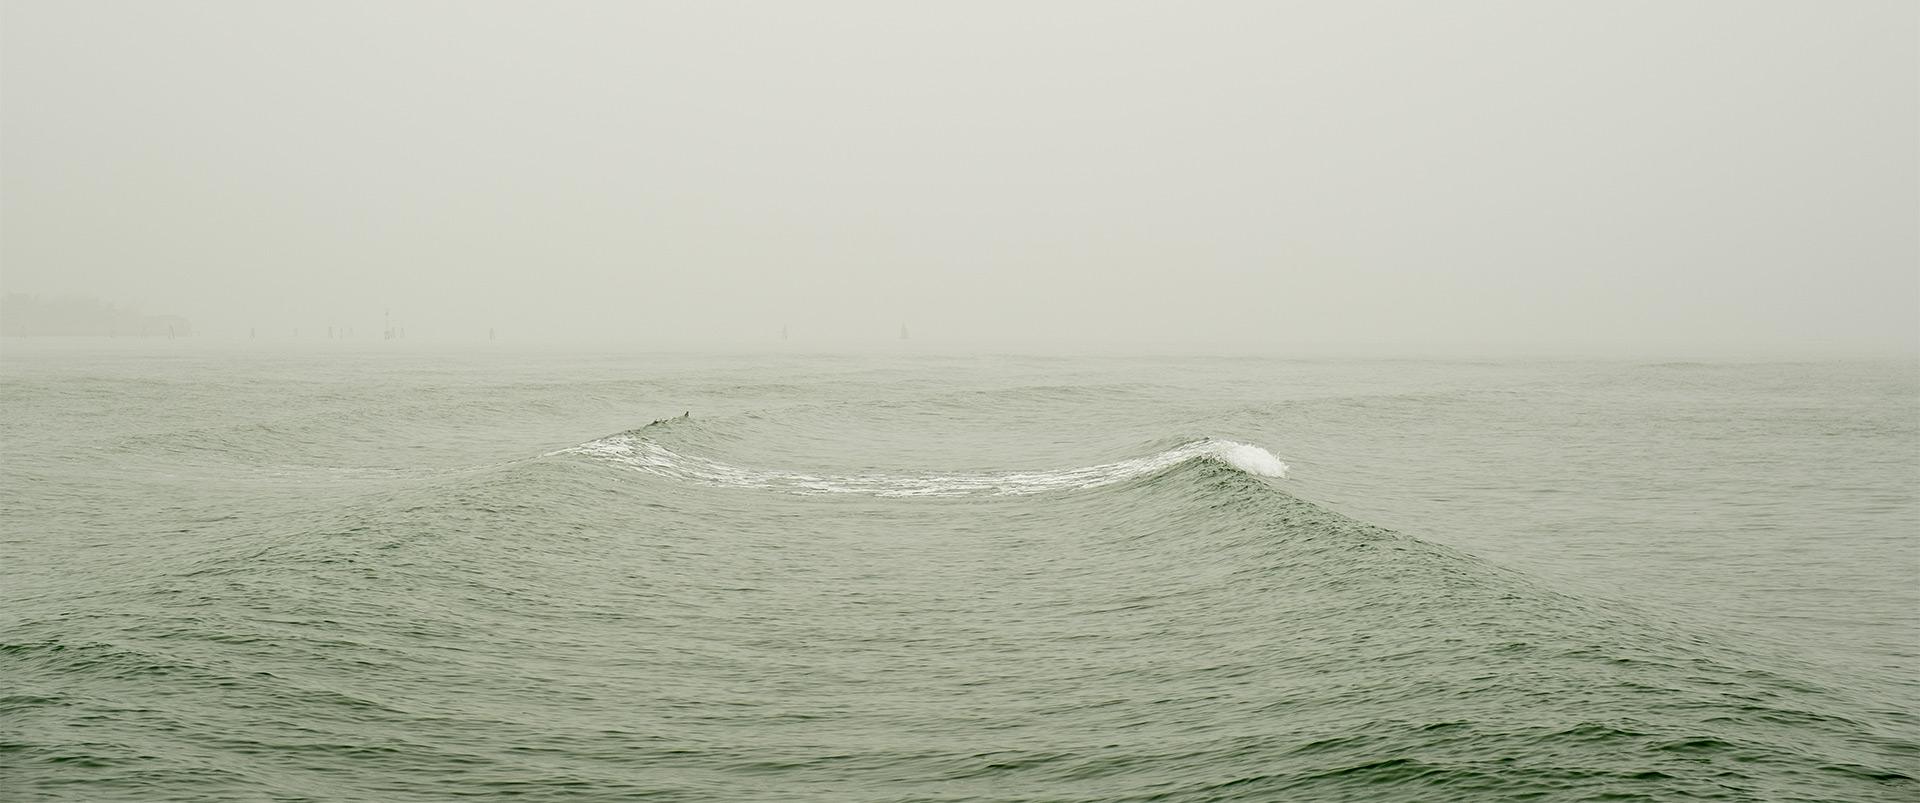 Wake and Waves / Venice Show the Original Fujinon XF 16-55mm f/2.8 Fujifilm X-T2 Black & White [wake and waves o]